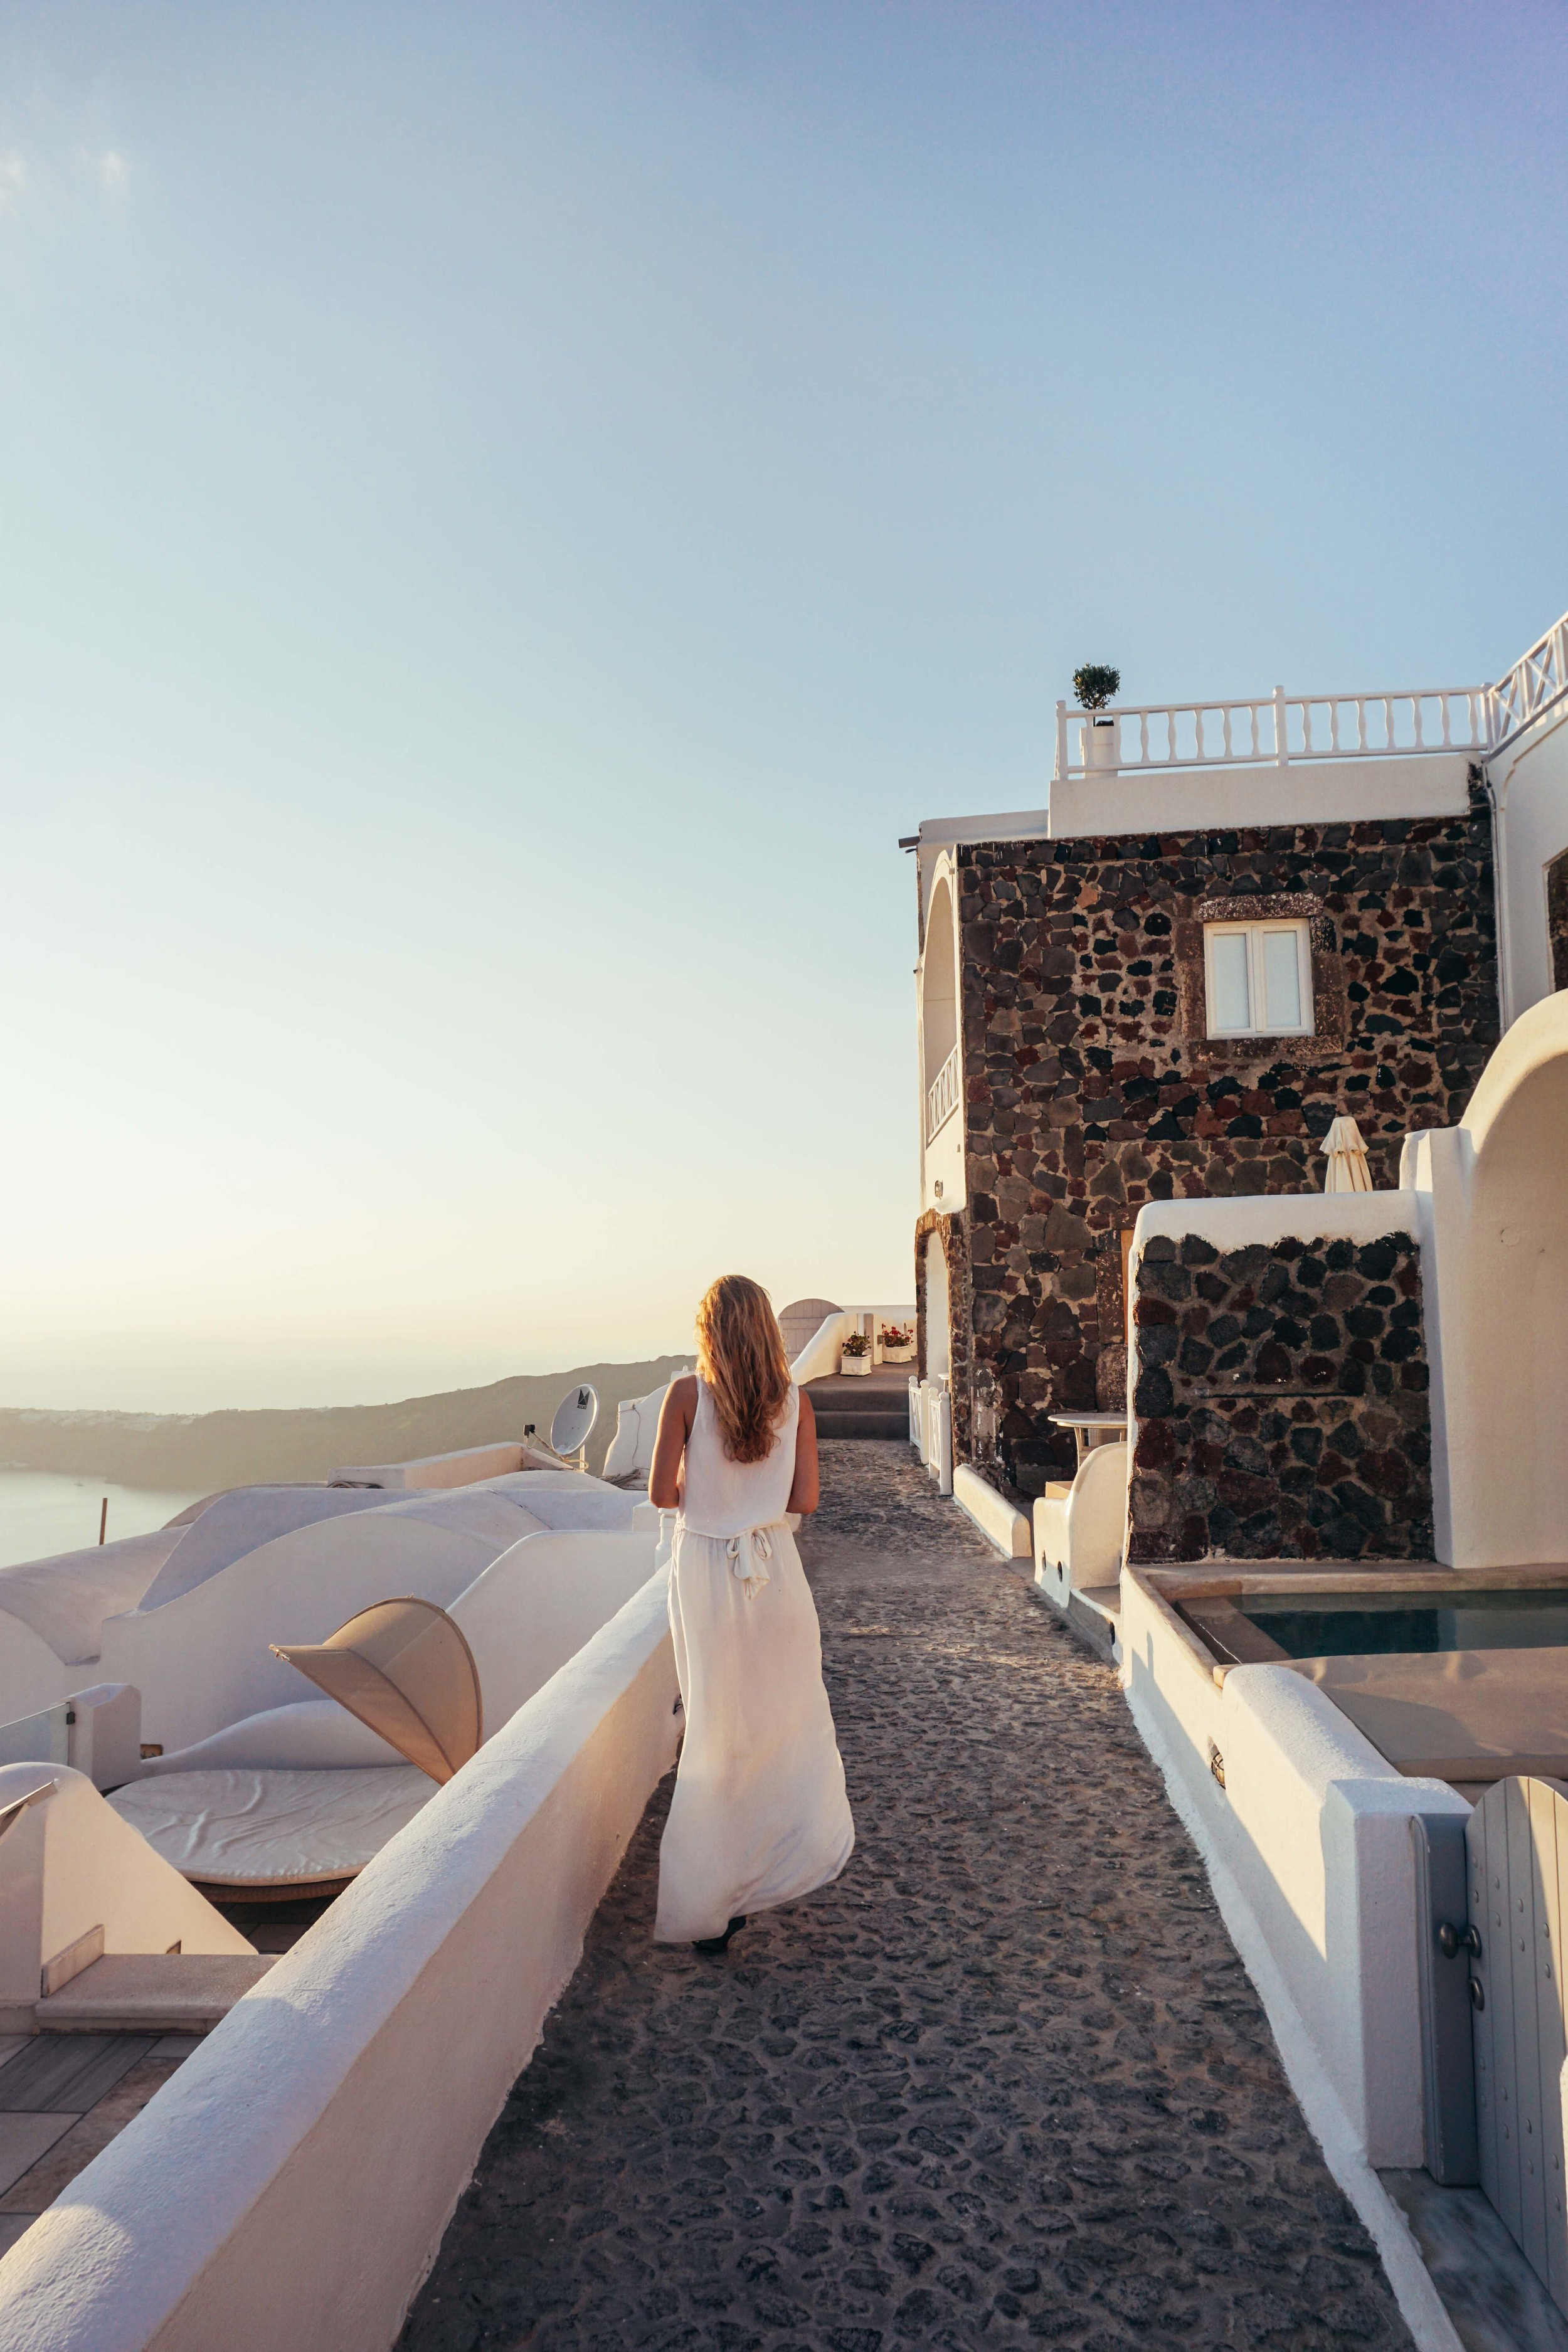 Greece, Santorini, Imerovigli